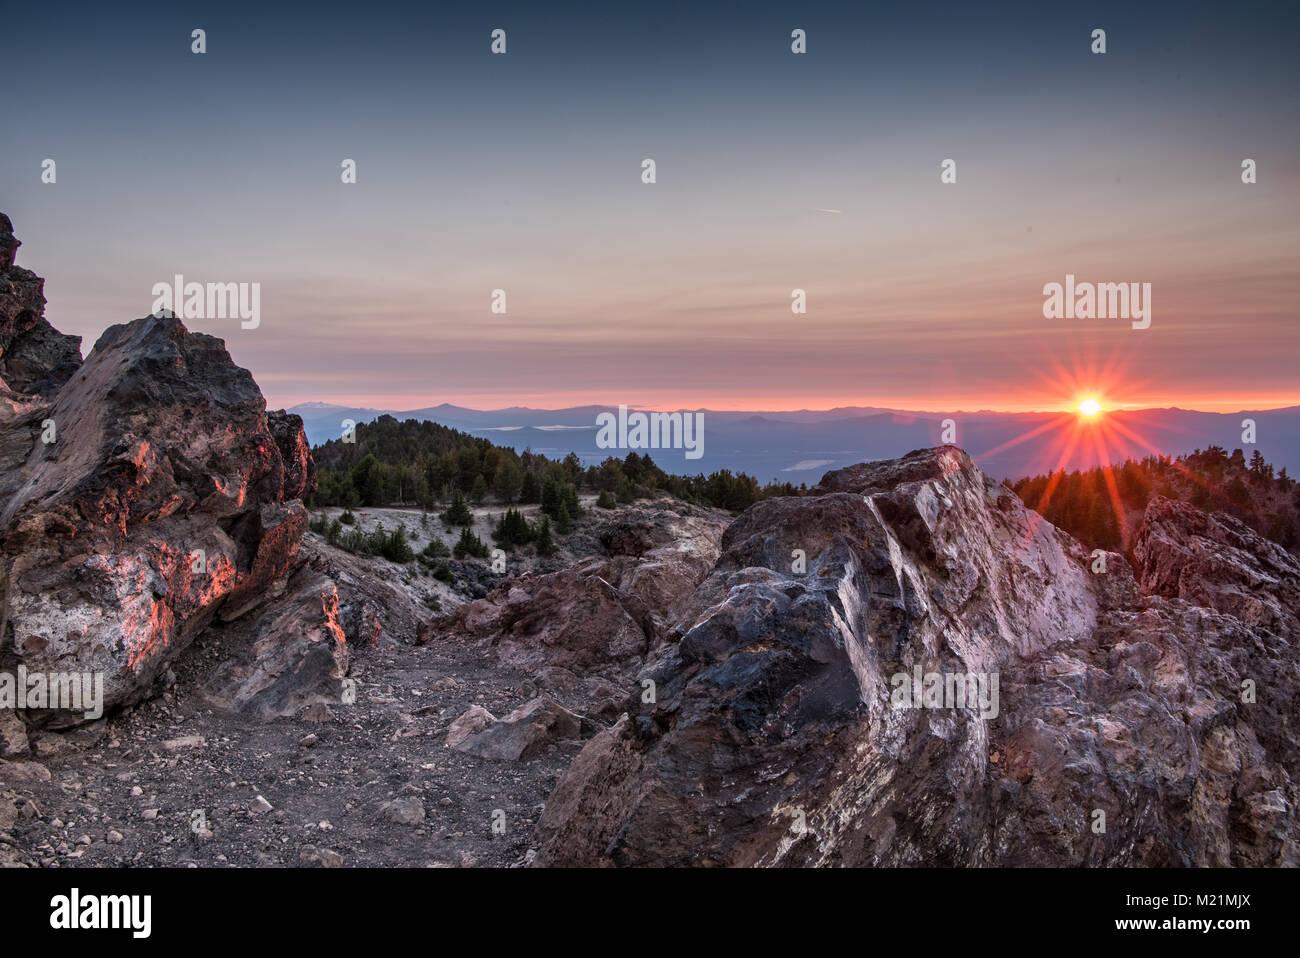 Sunset Lights Up Rocks on Paulina Peak - Stock Image